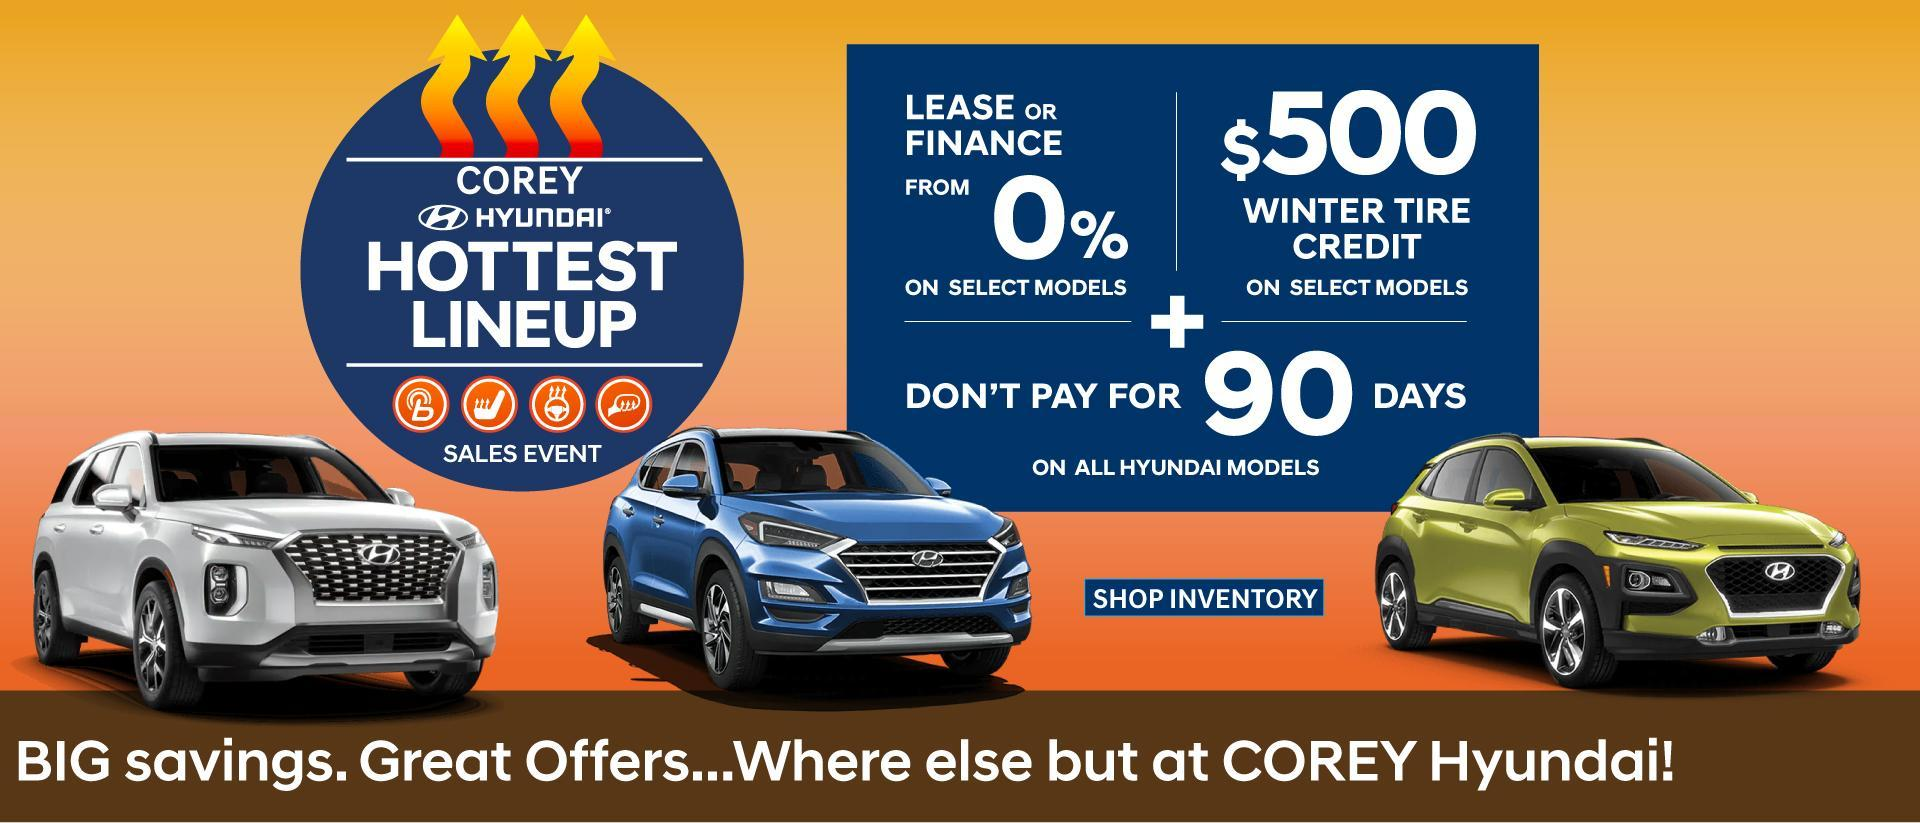 Corey Hyundai - Hottest Event